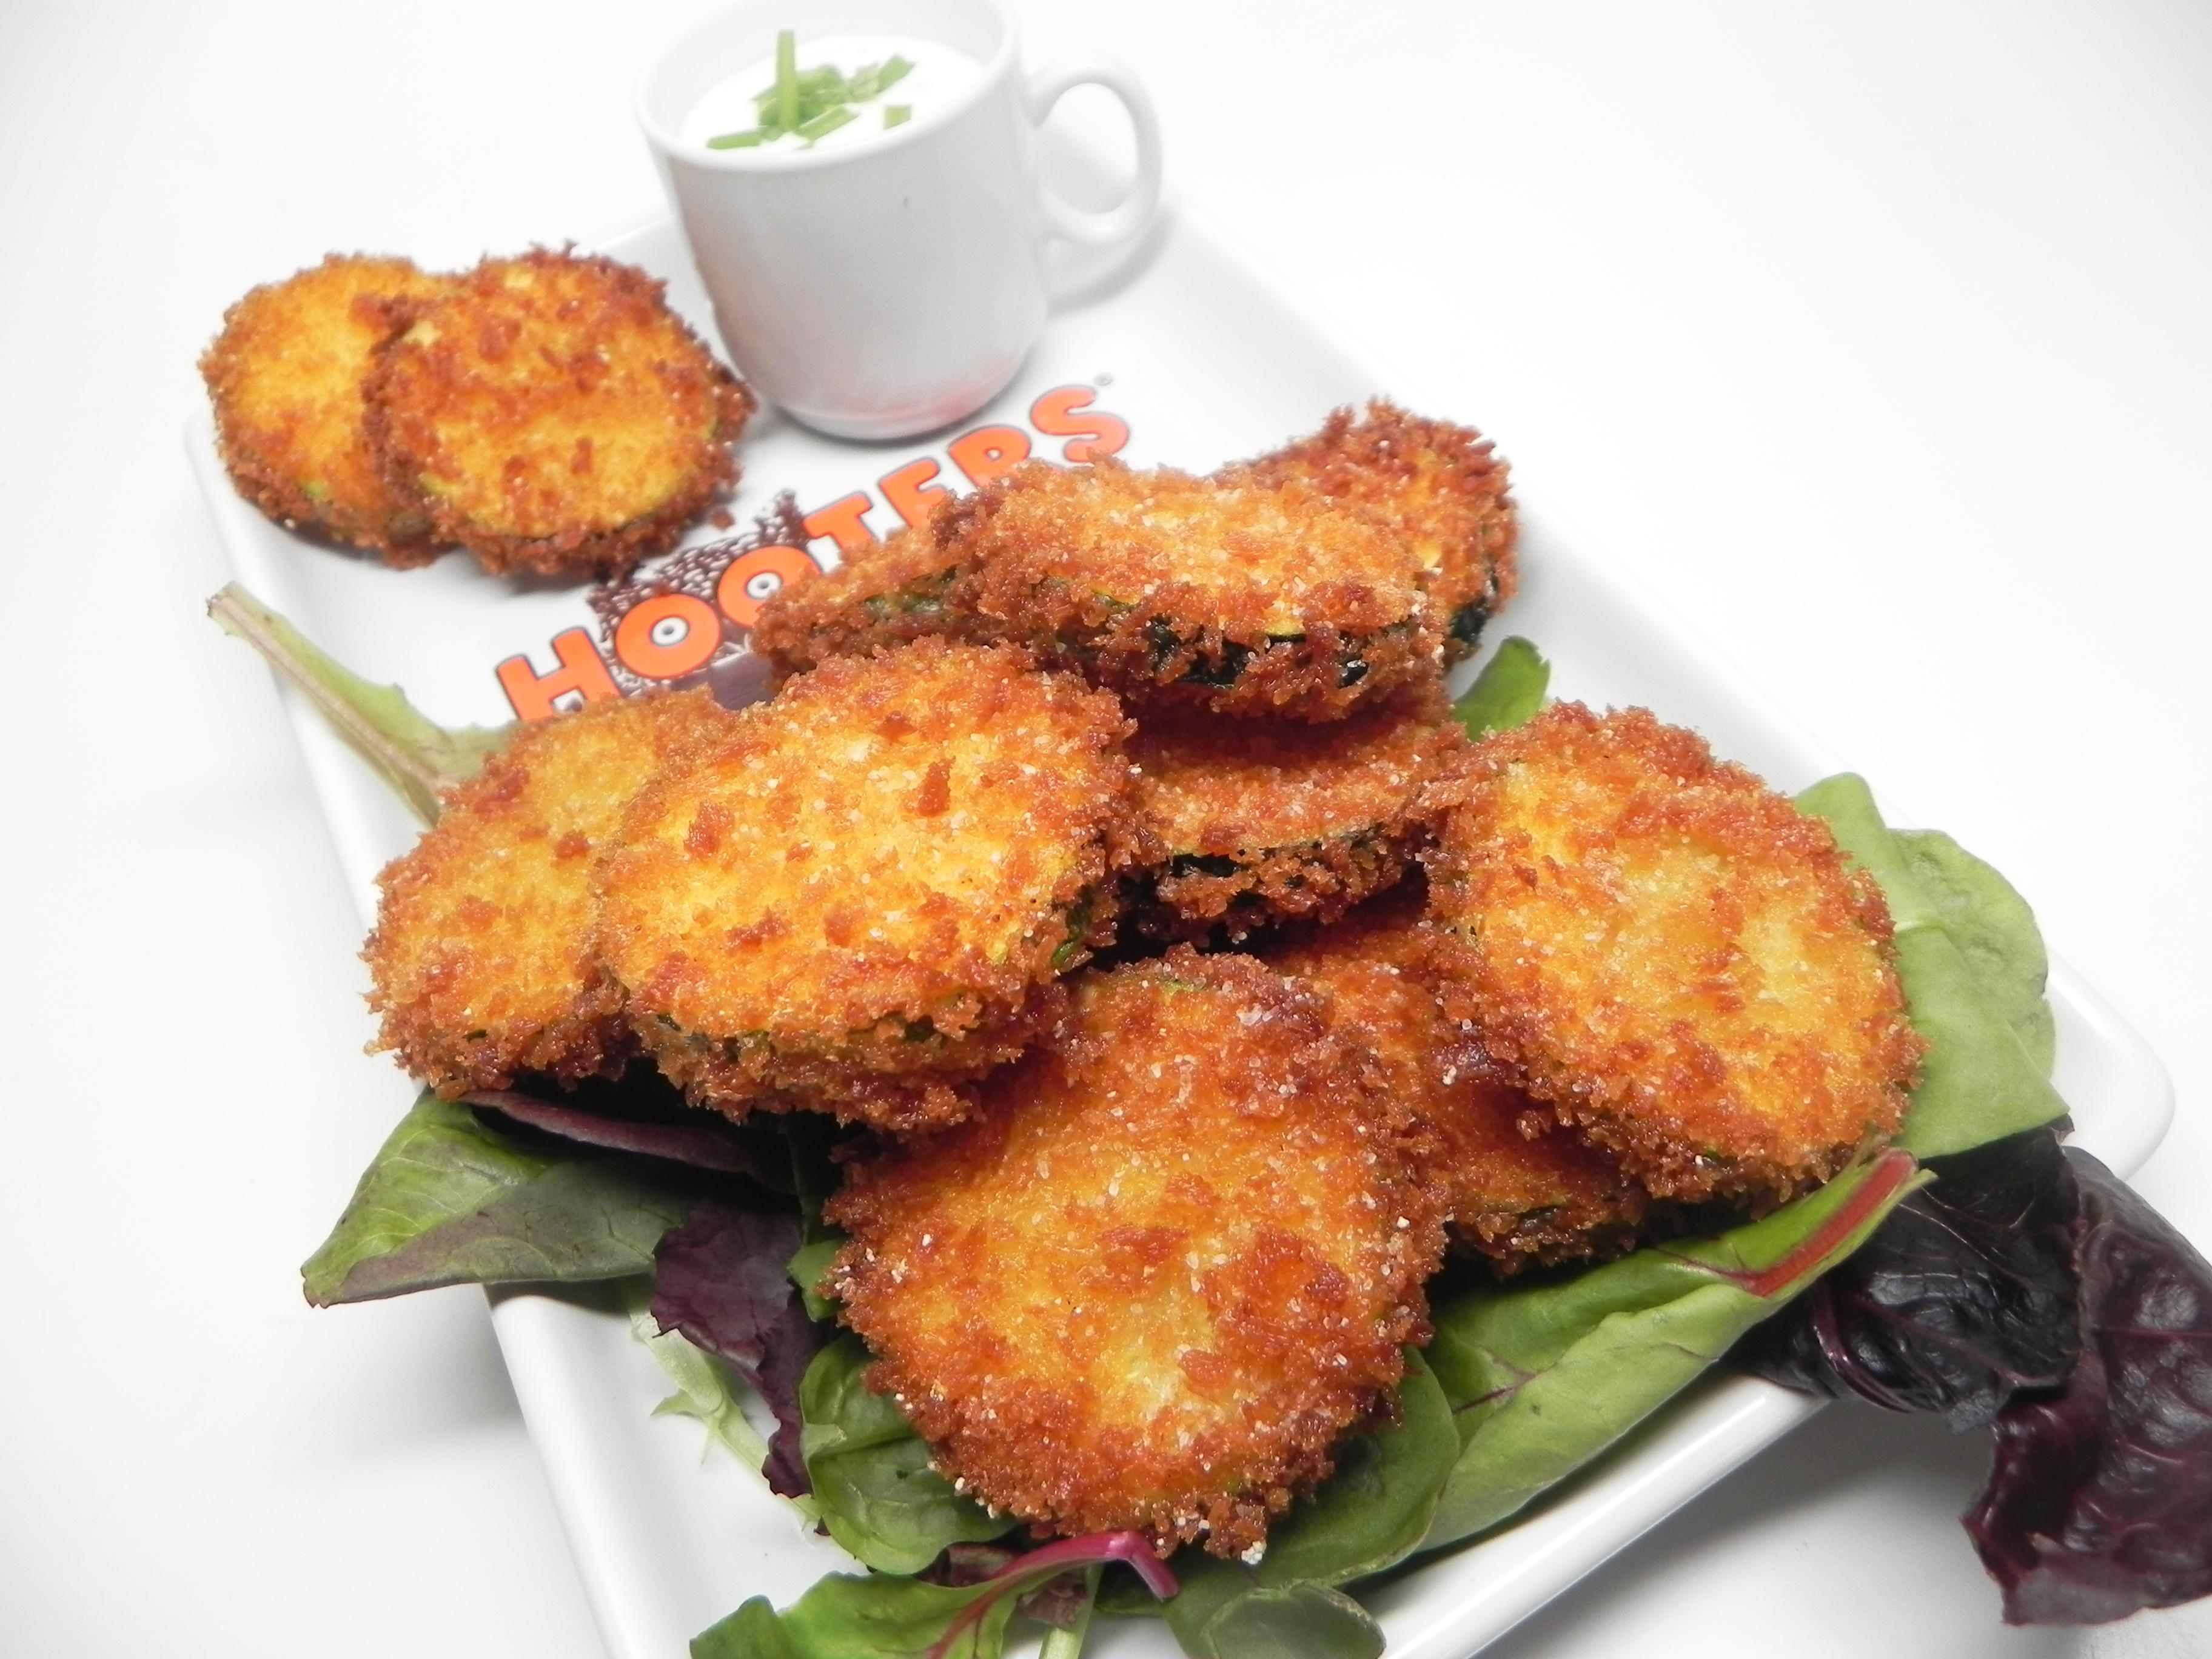 Easy Pan-Fried Zucchini